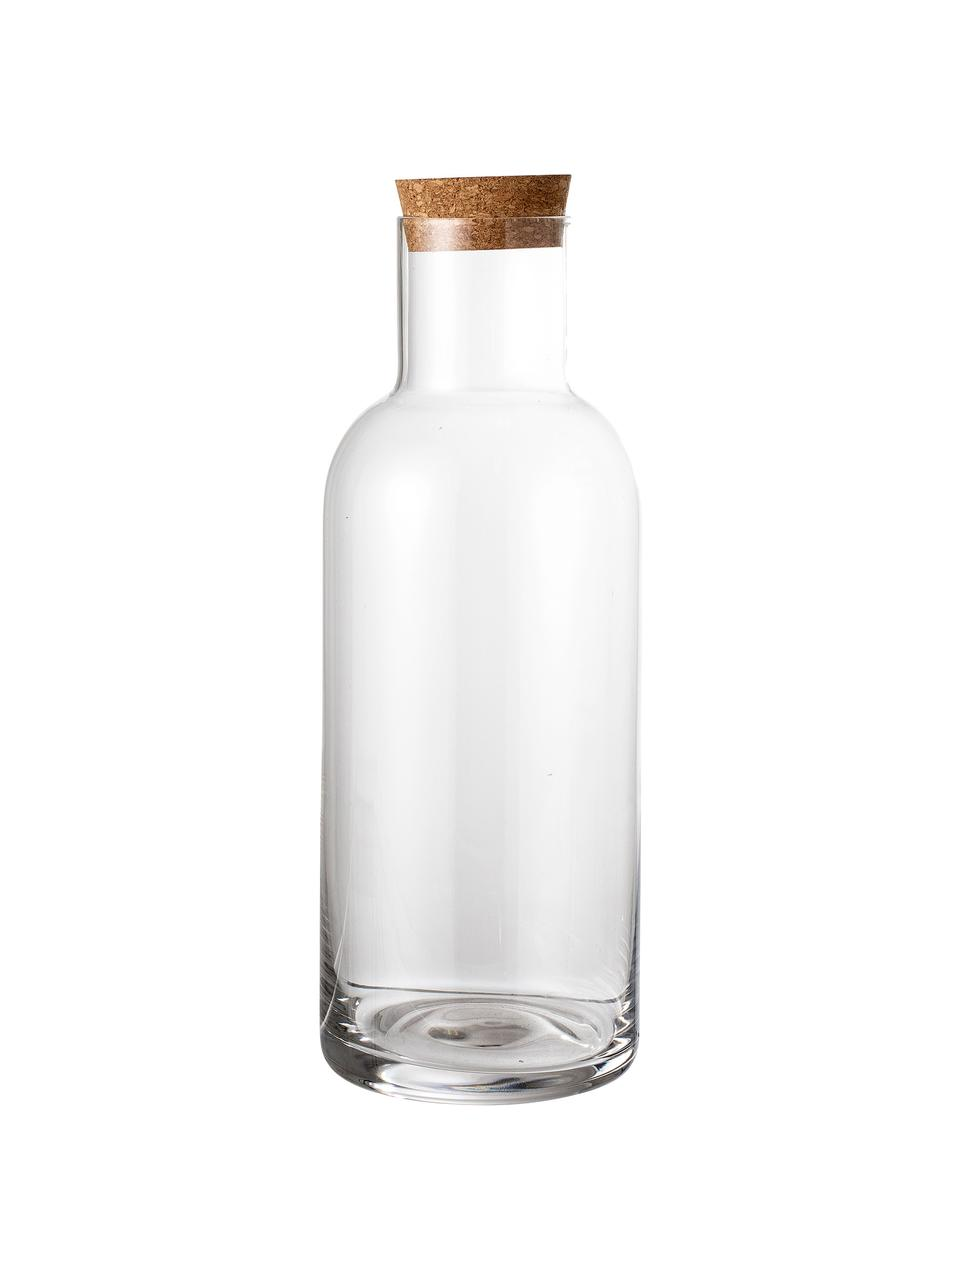 Karaffe Clearance in Transparent, 1 L, Deckel: Kork, Transparent, 1 L